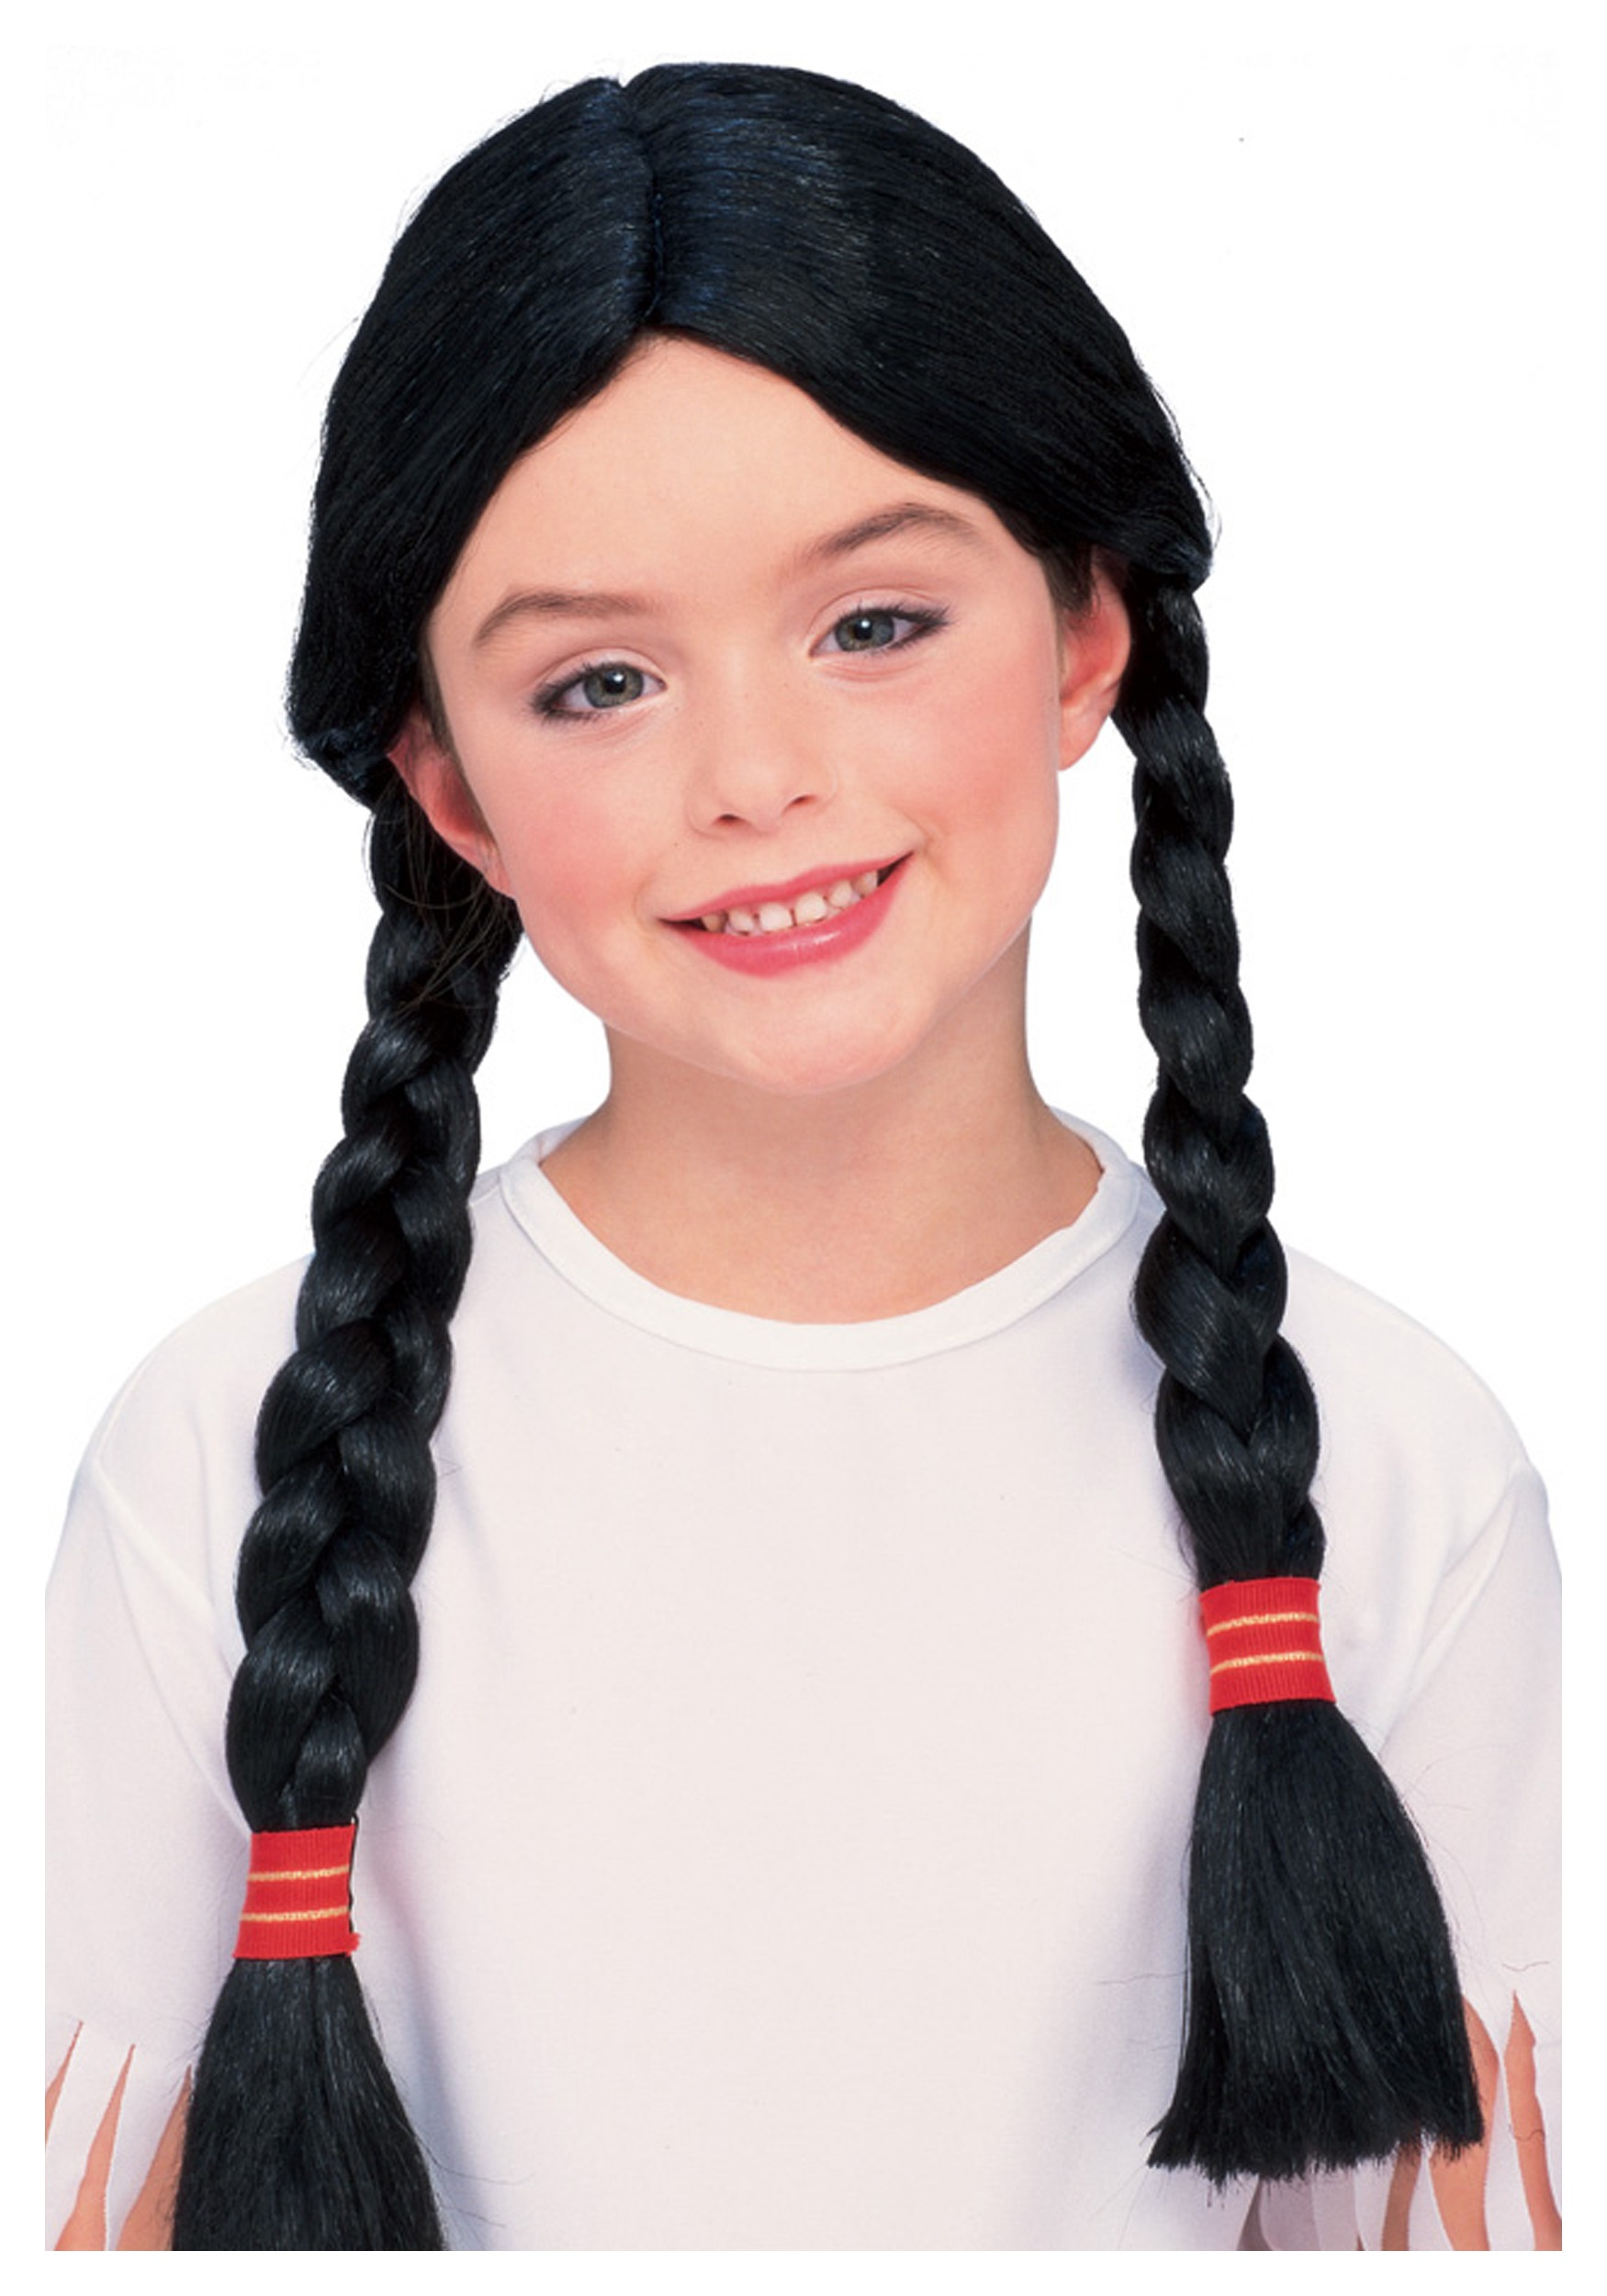 Girls Native American Costume Wig